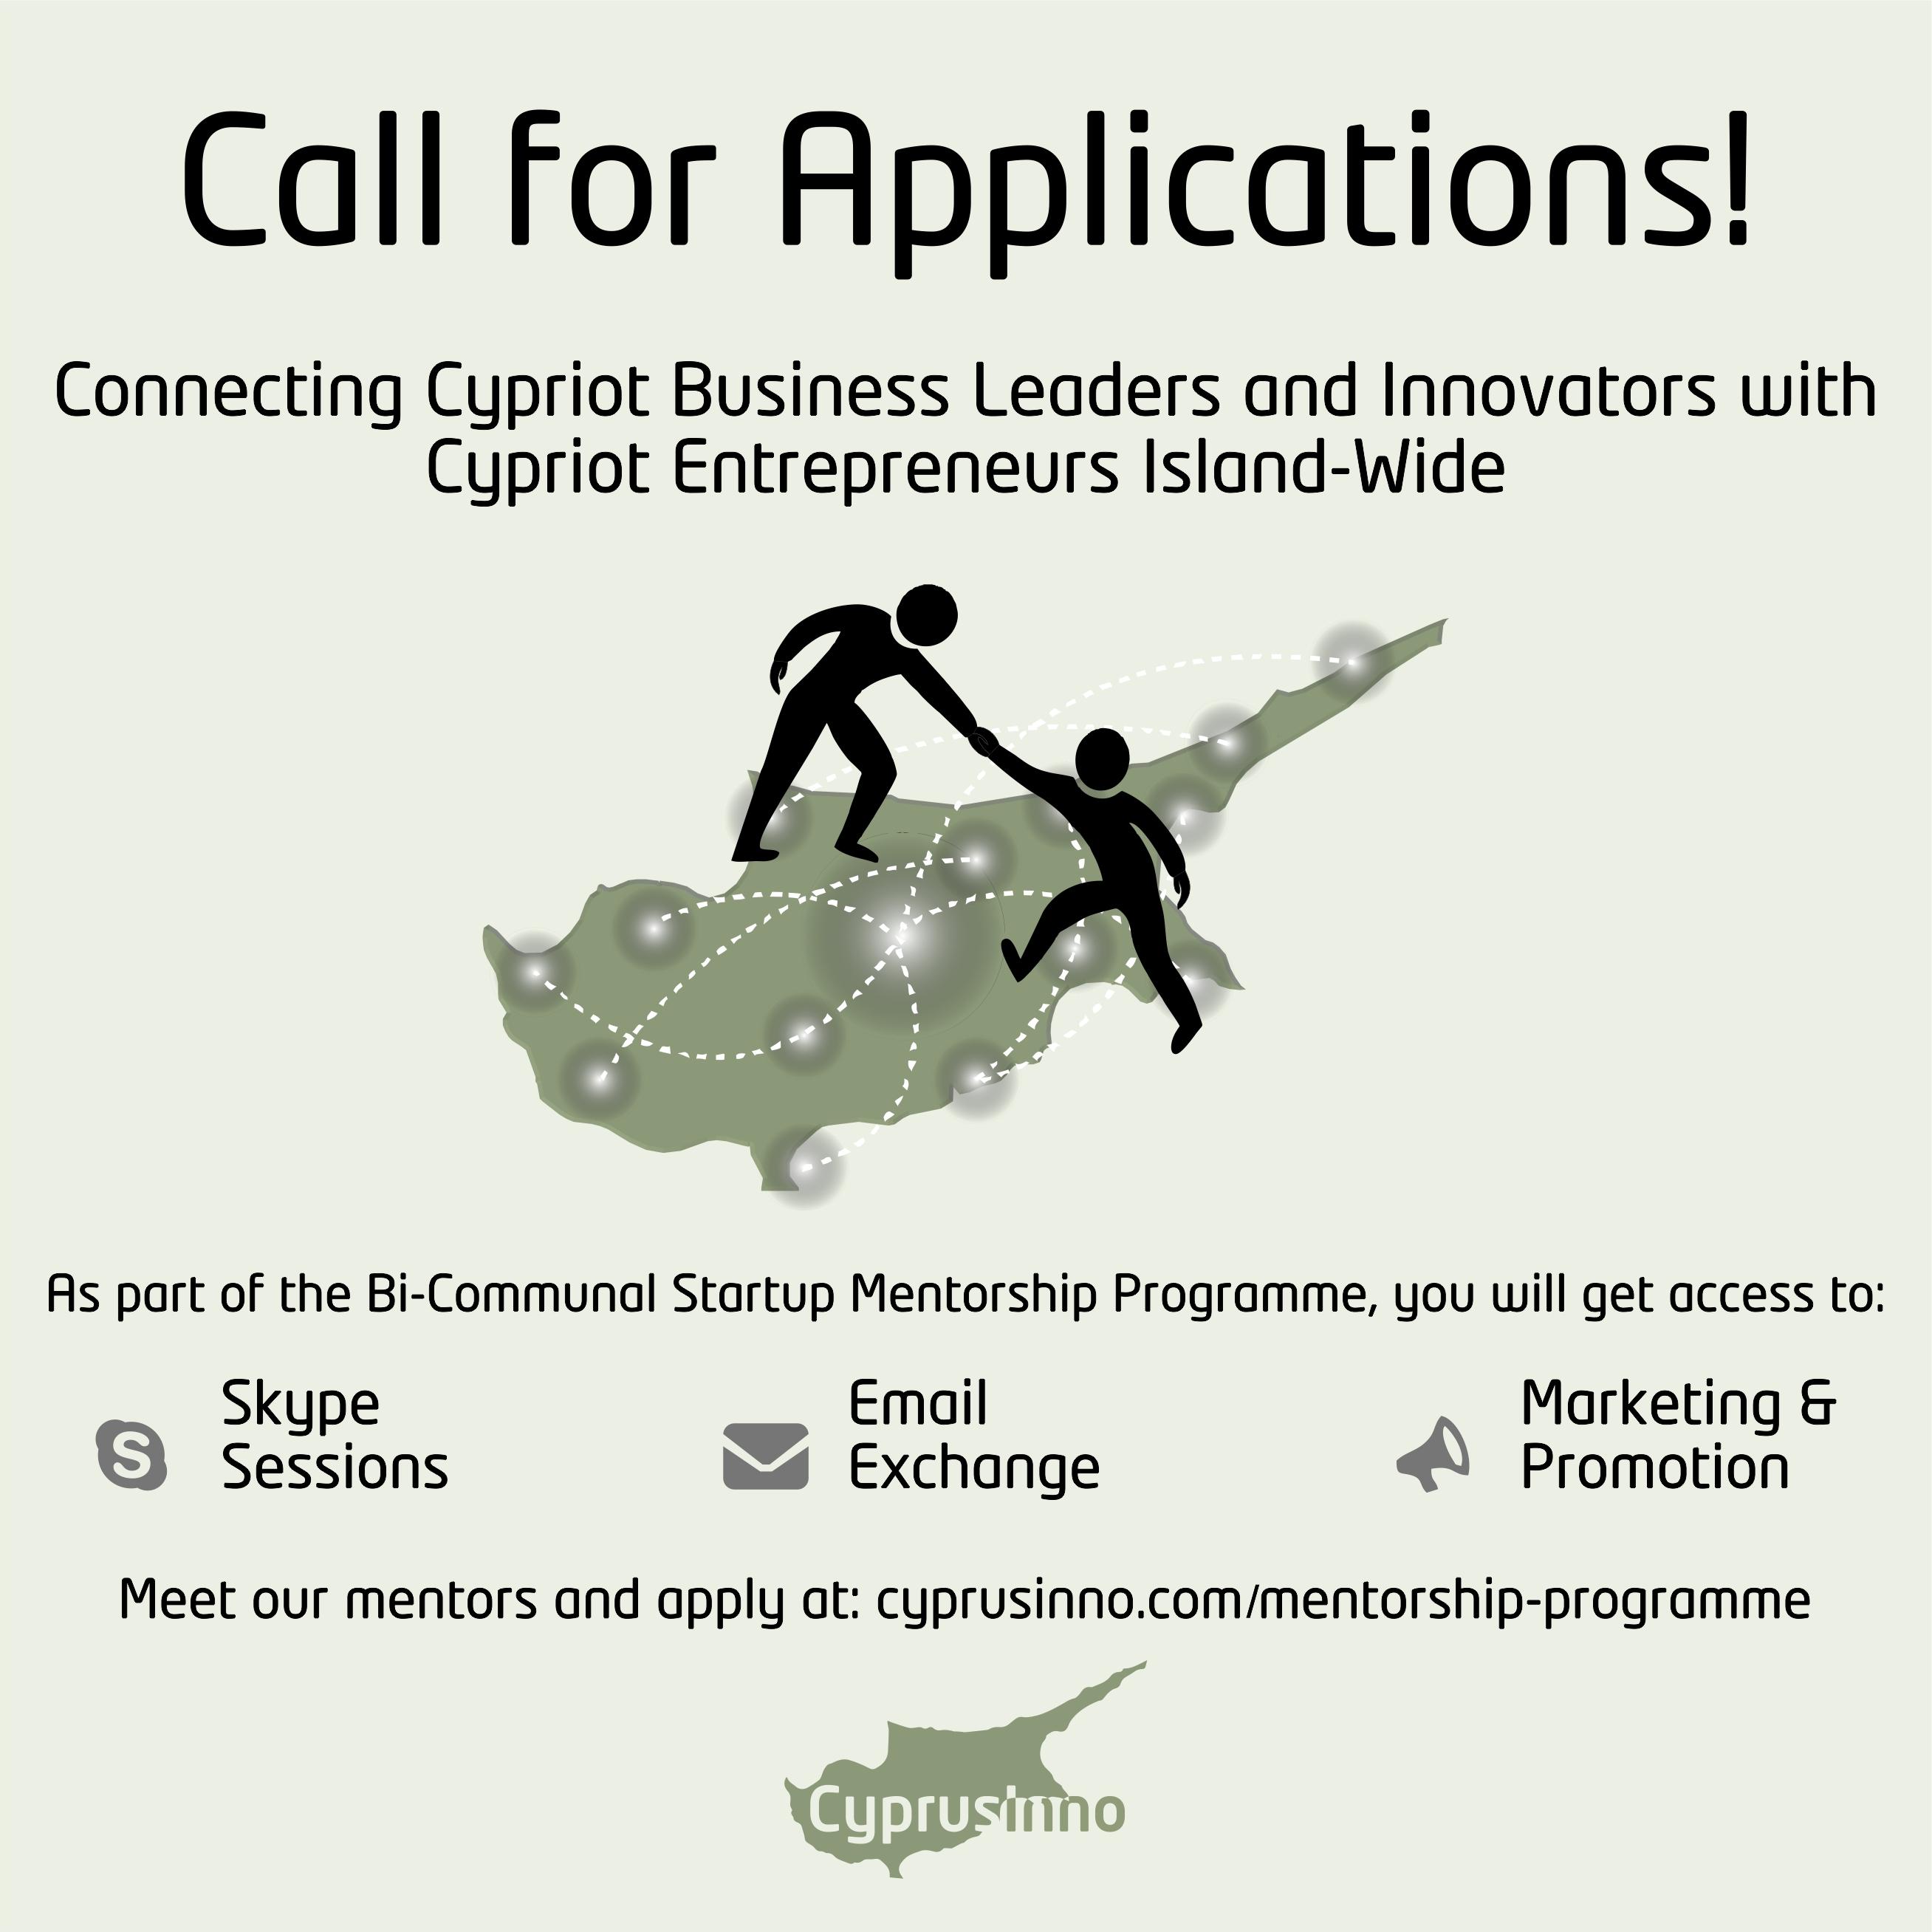 Bi-Communal Startup Mentorship Programme - CyprusInno cyprus